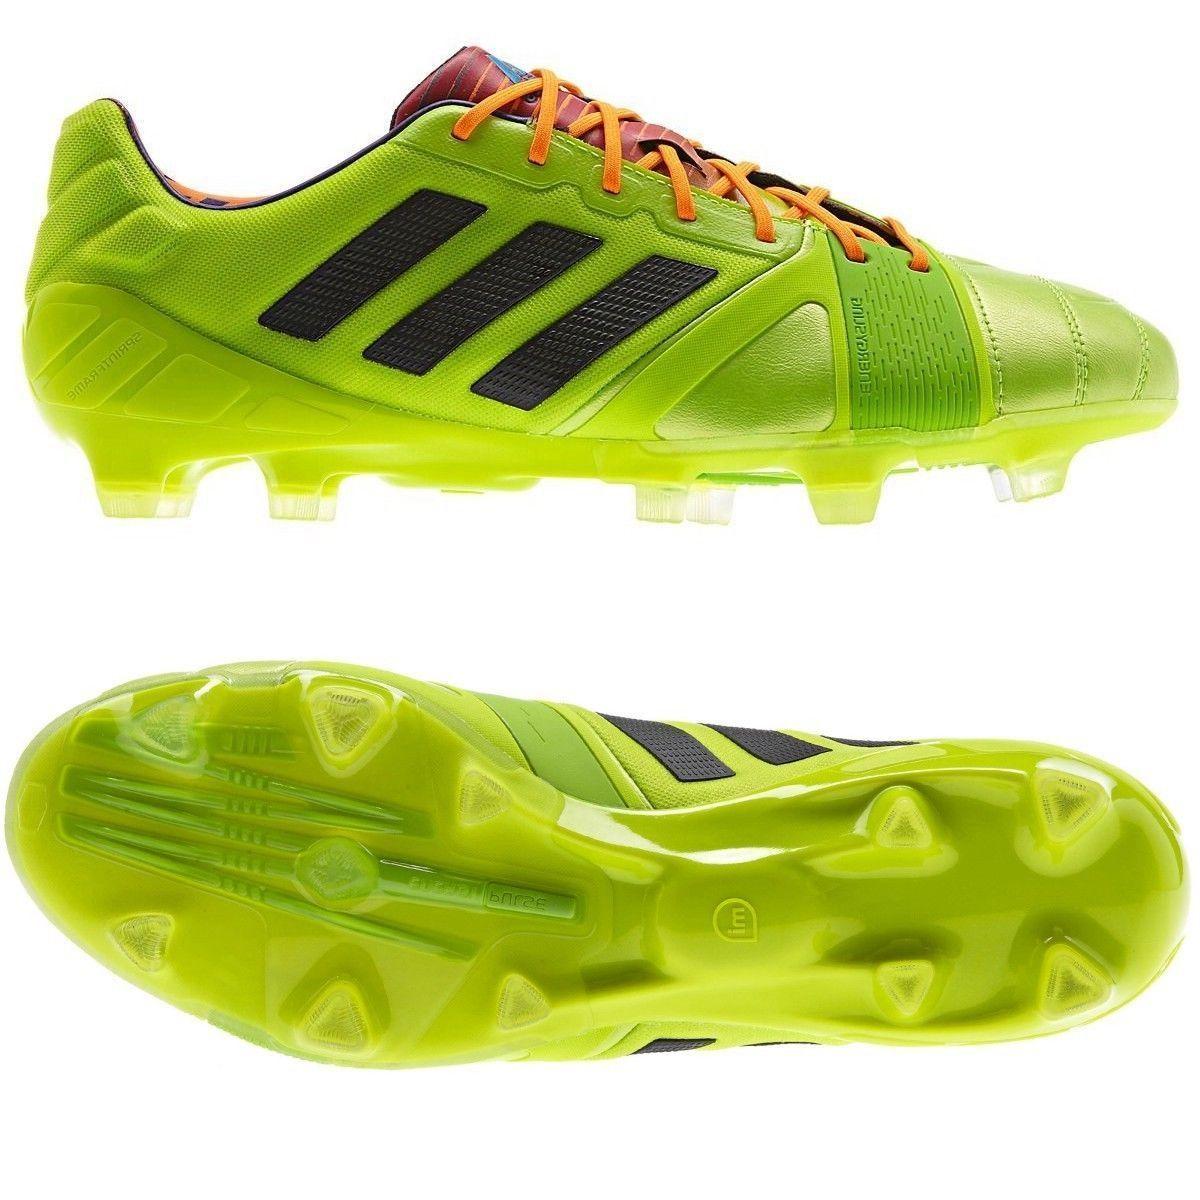 Adidas Nitrocharge 1.0 TRX Fg verde Lima Rendimiento Hombre botas de Fútbol